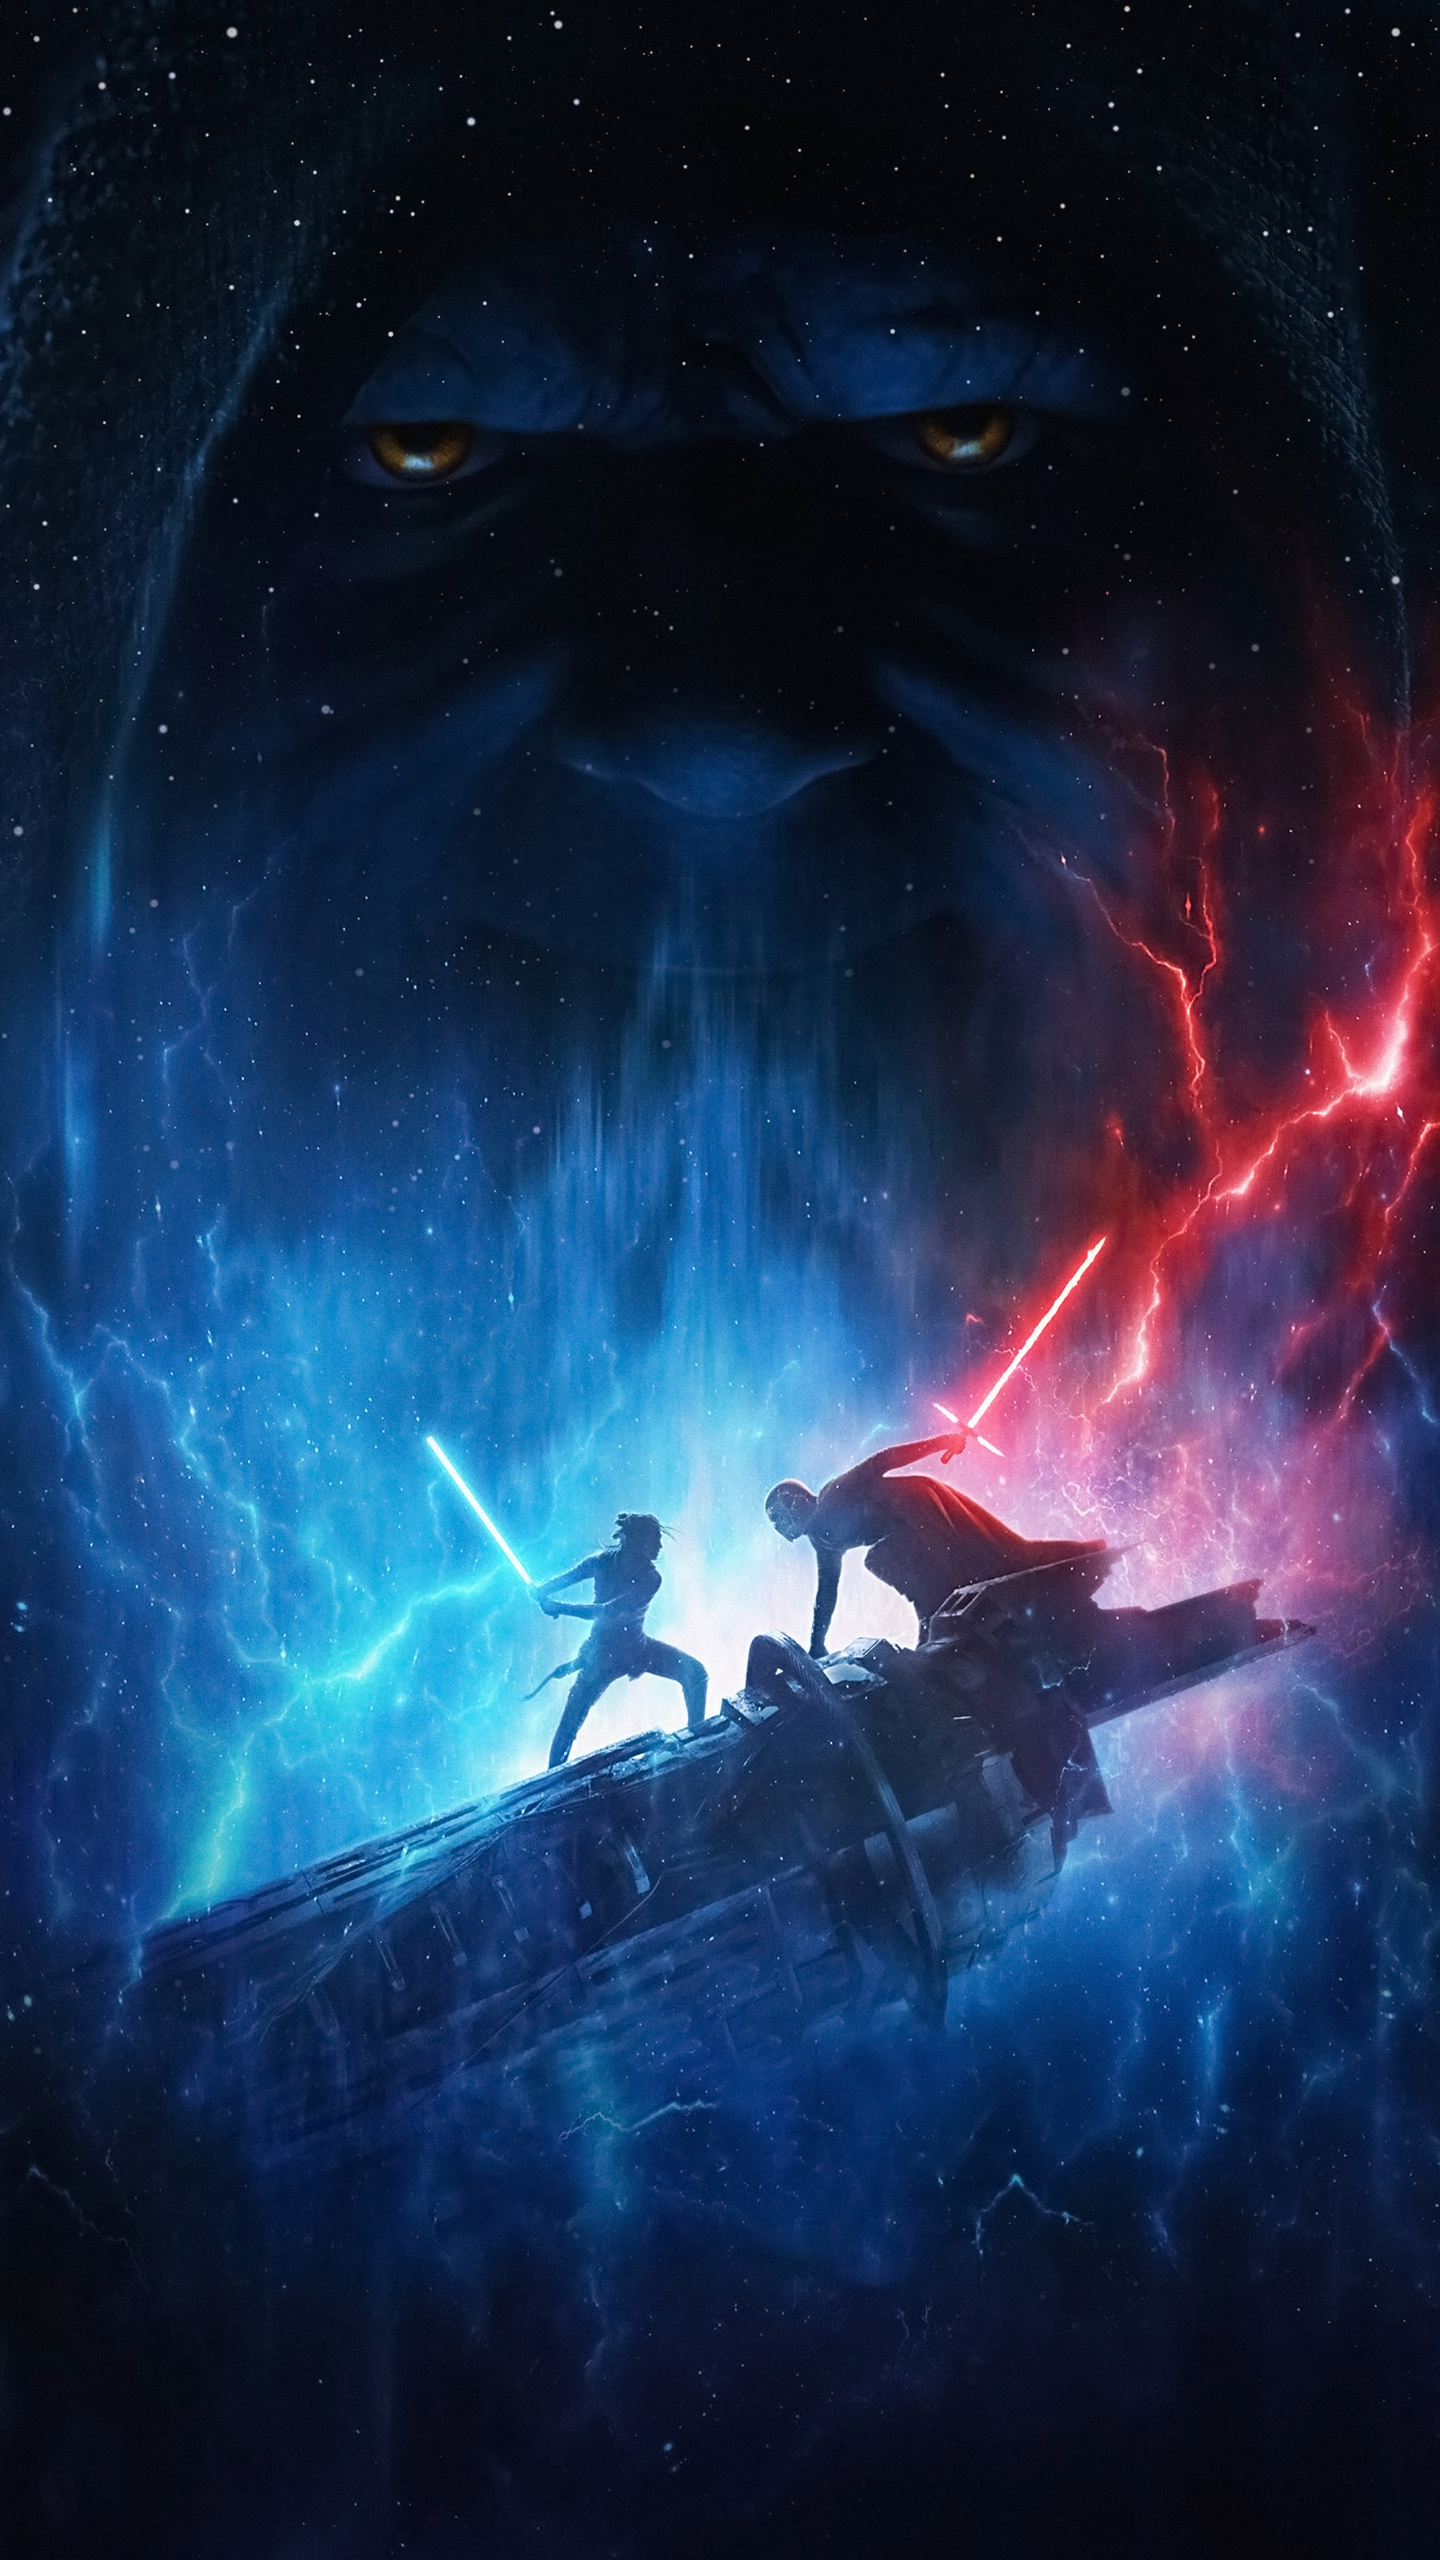 1440x2560 Star Wars The Rise Of Skywalker 2019 4k Samsung